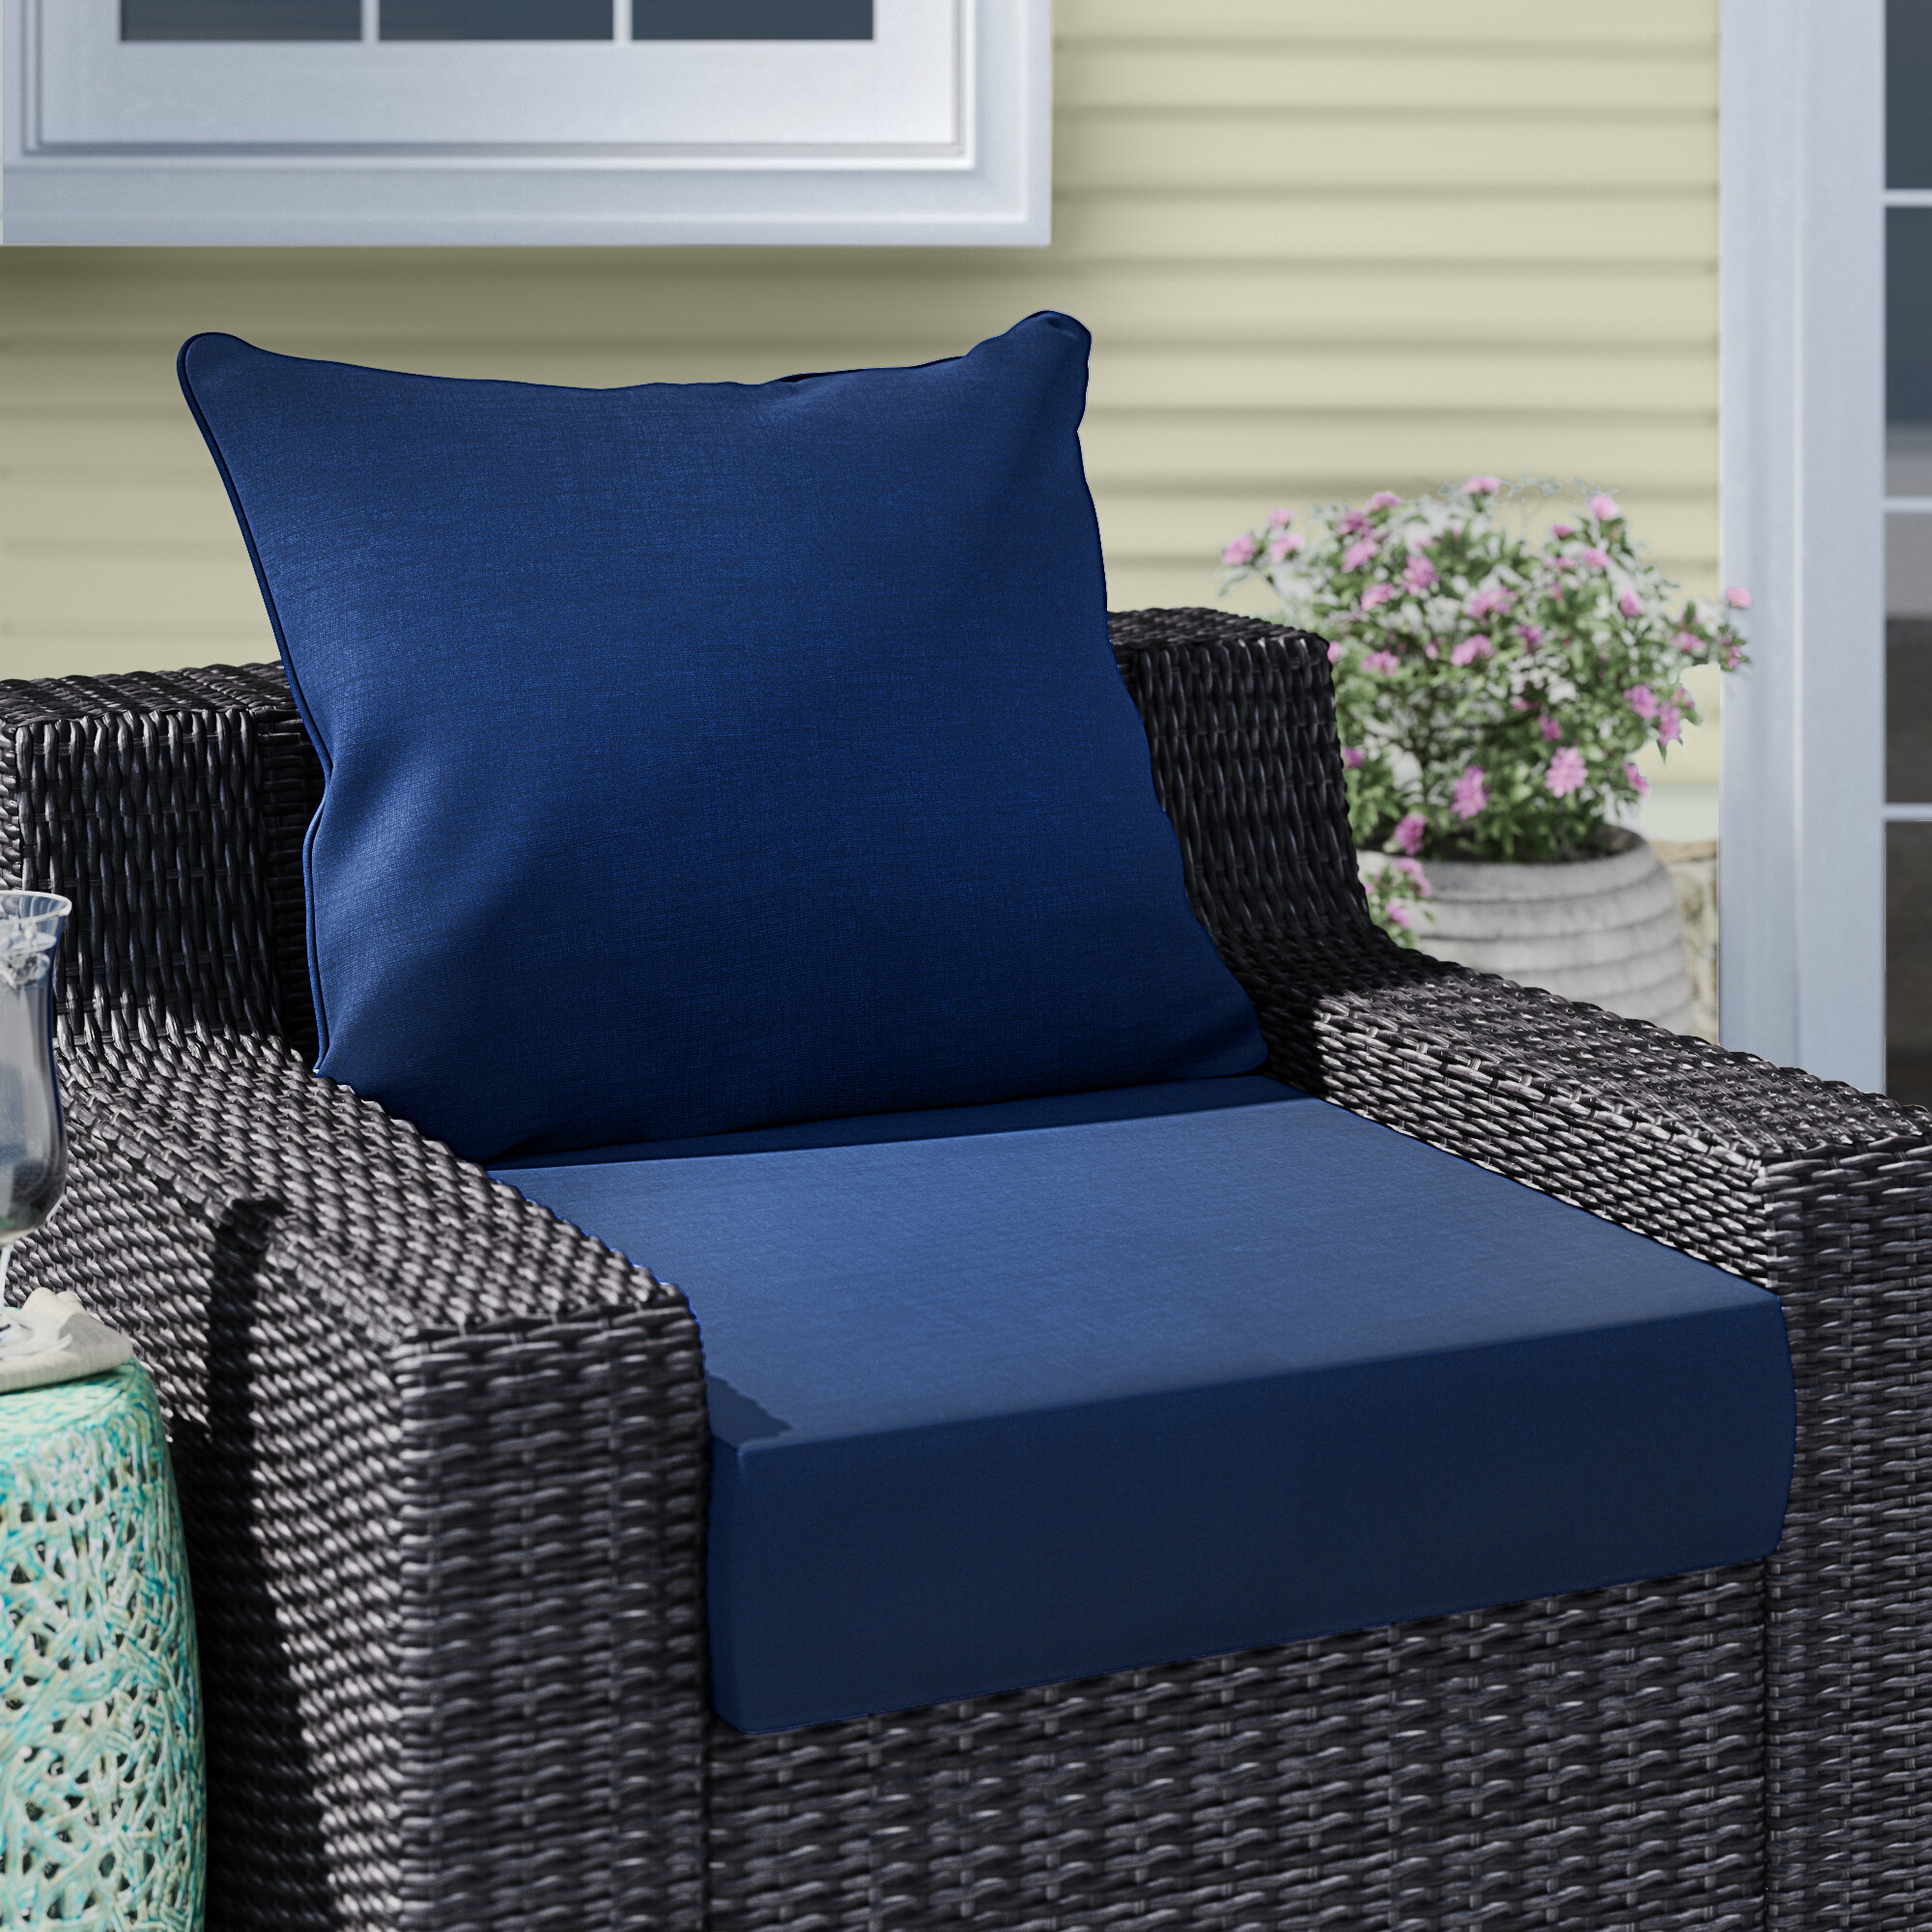 Super Longshore Tides Texture Outdoor Lounge Chair Cushion Cjindustries Chair Design For Home Cjindustriesco